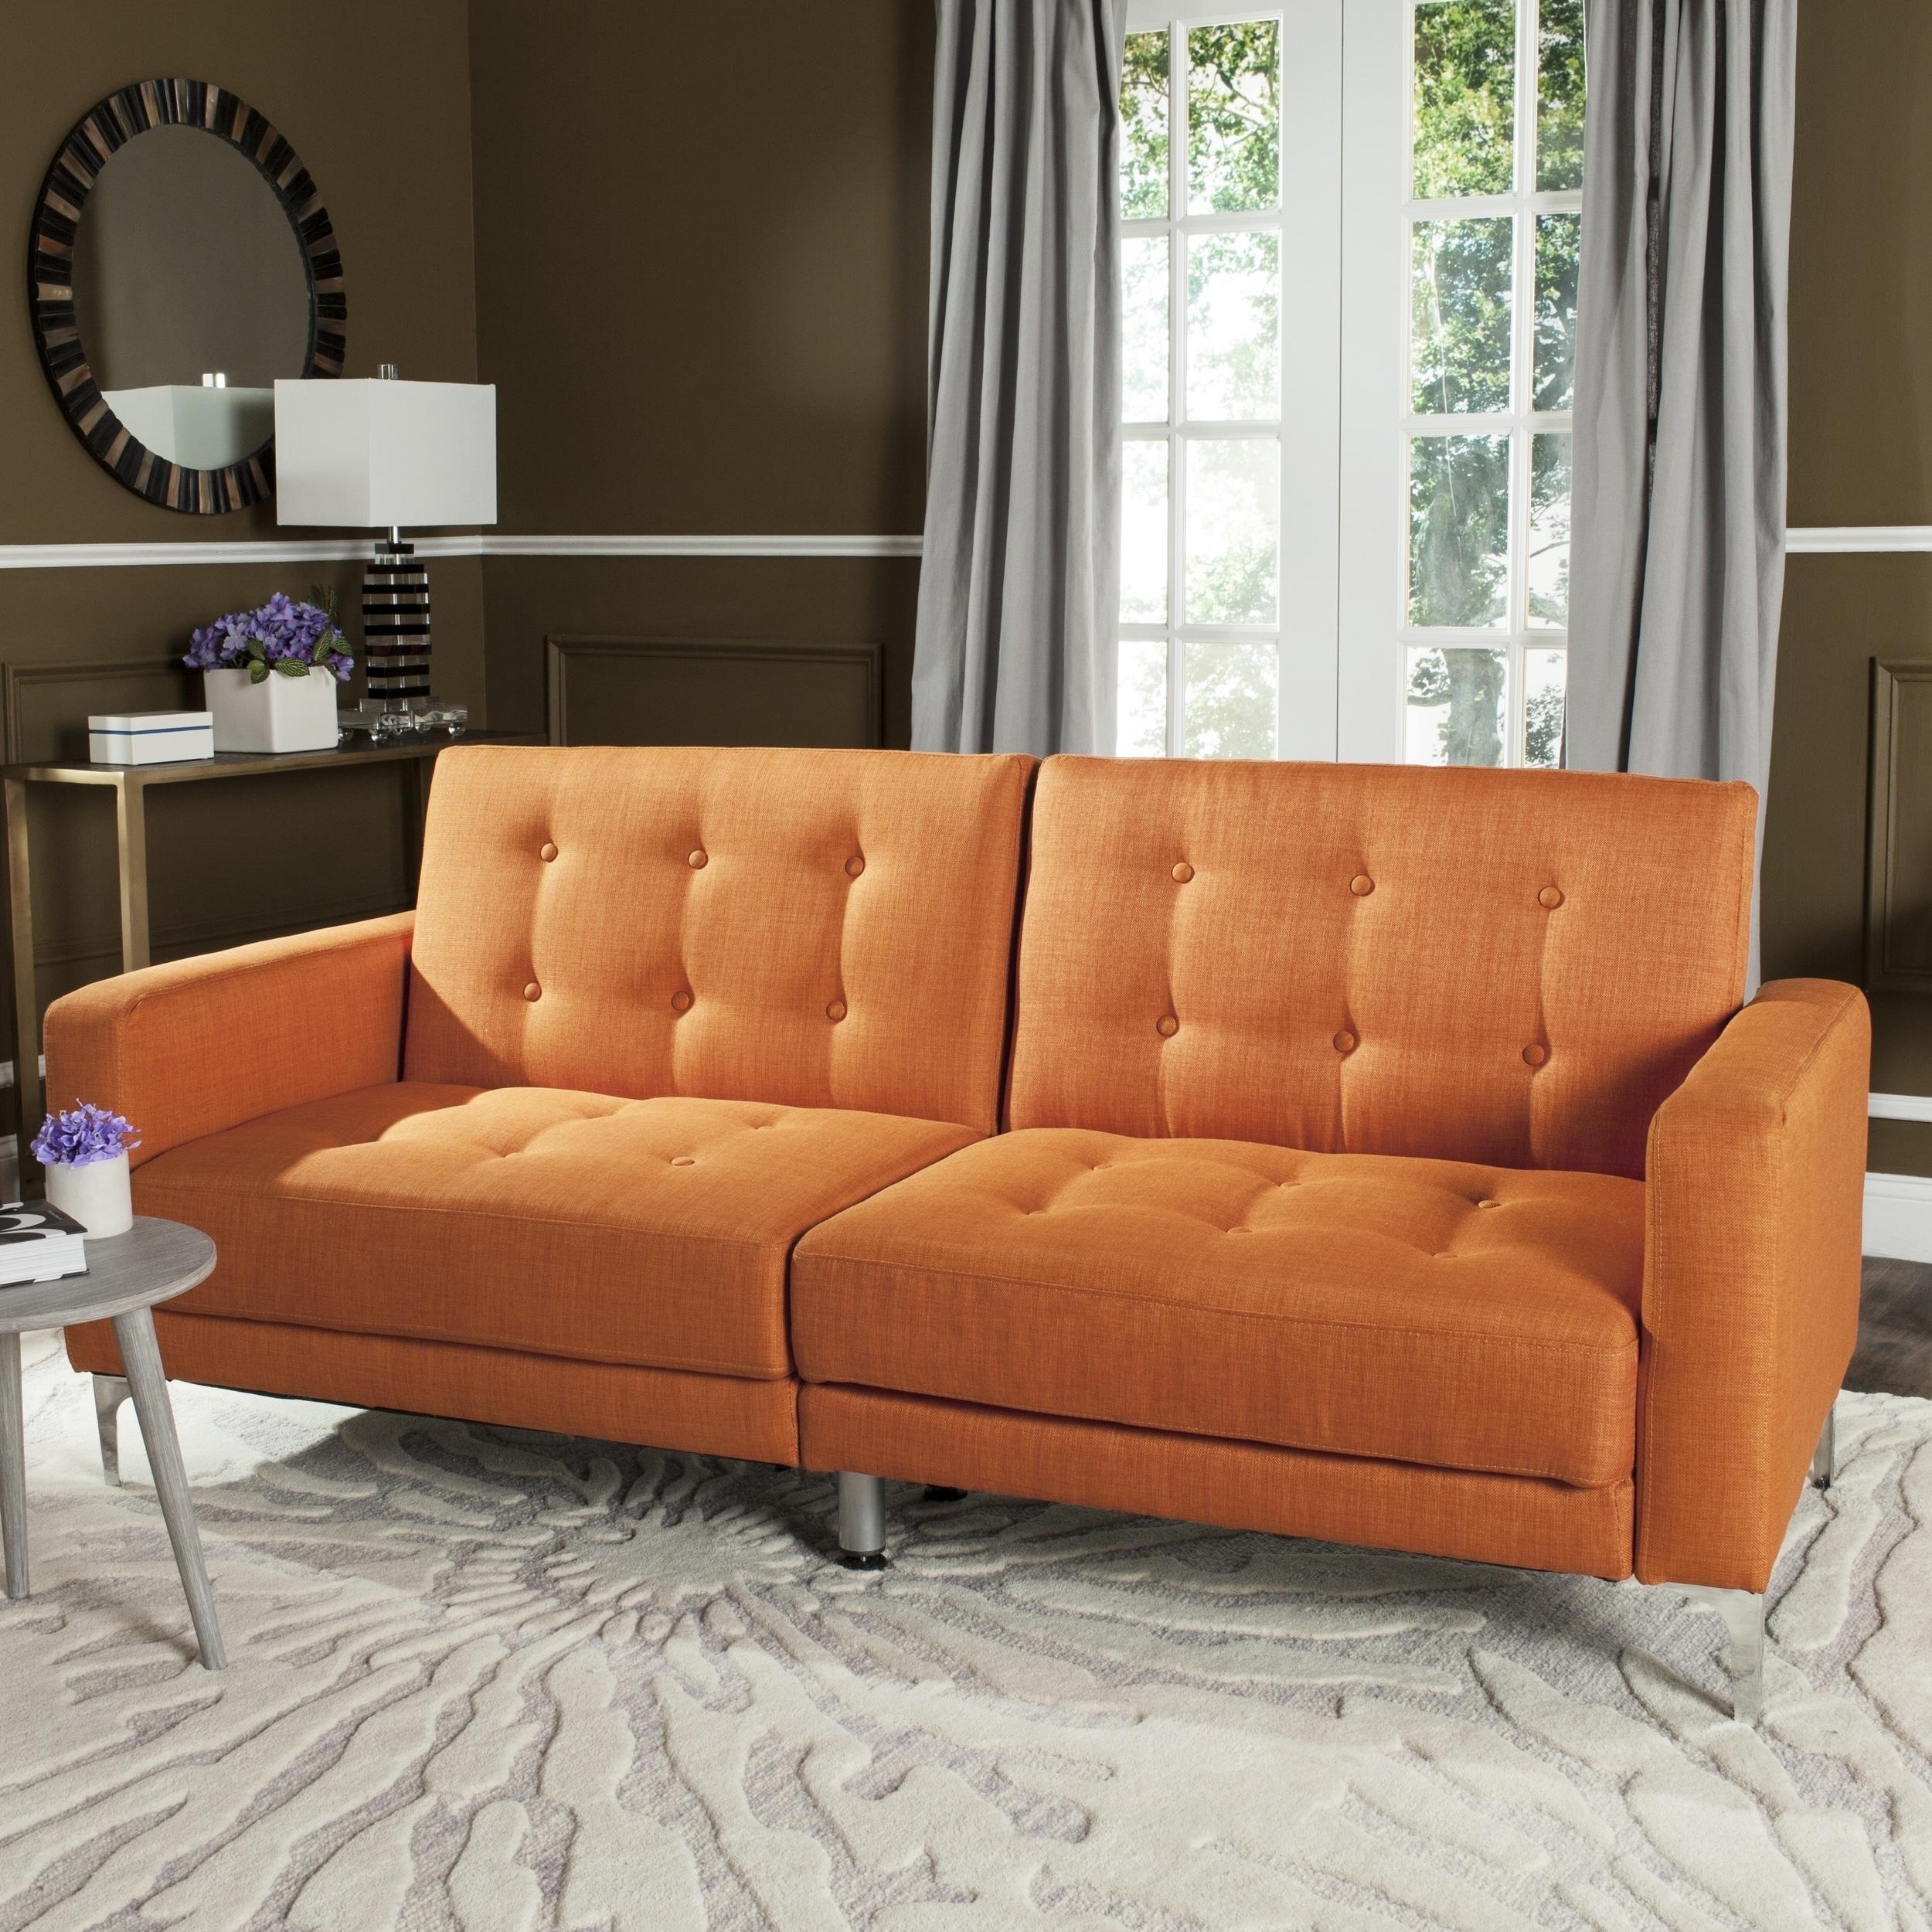 Safavieh Soho Two in e Foldable Orange Loveseat Sofa Bed Free